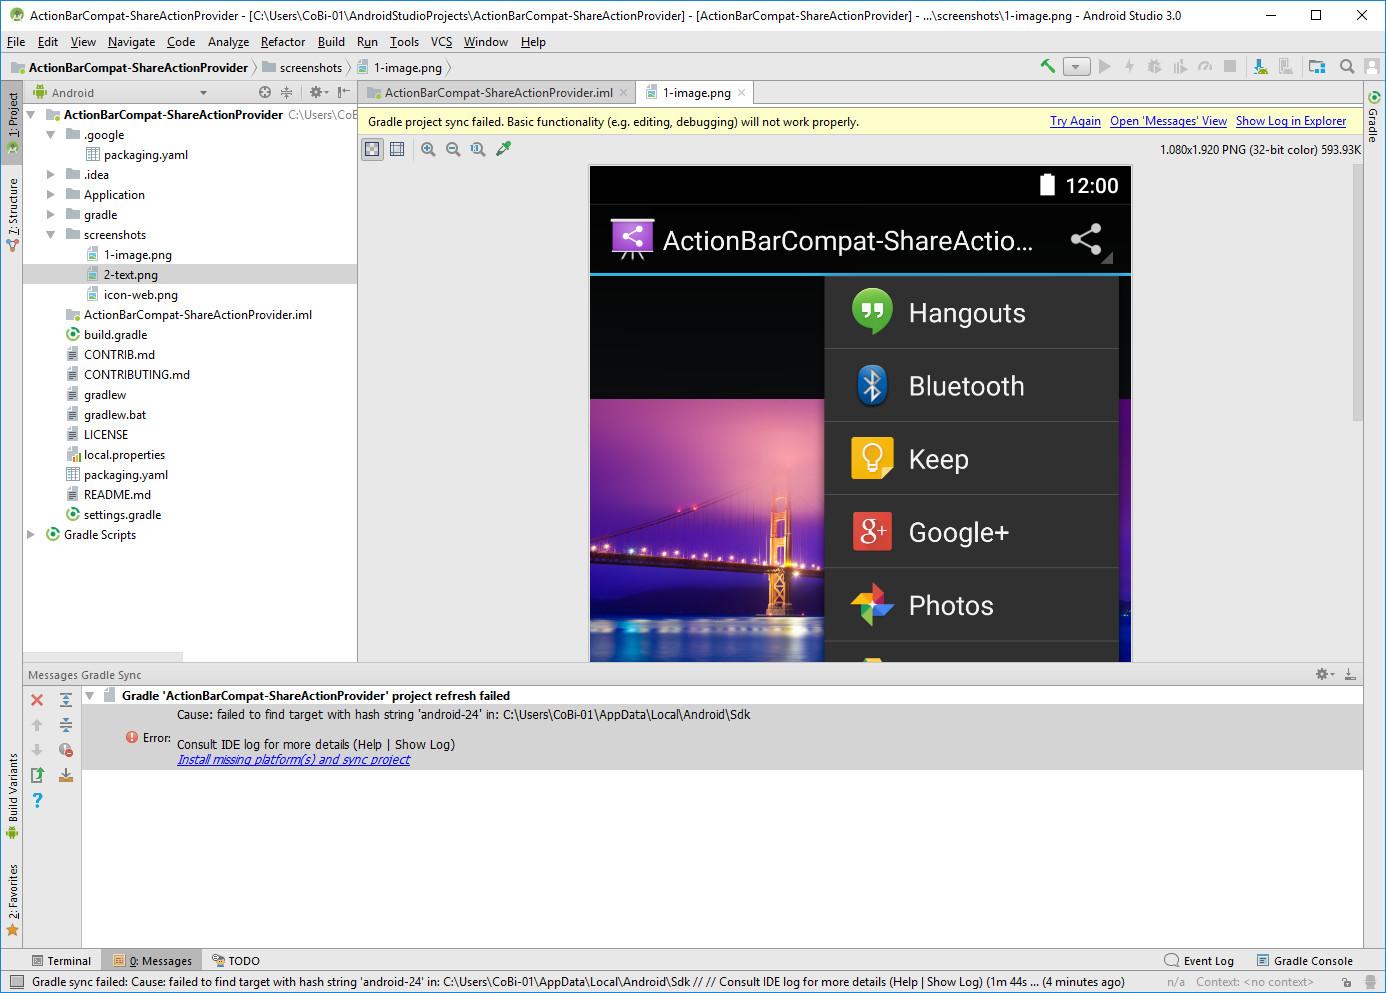 Screenshot 1 - Android Studio